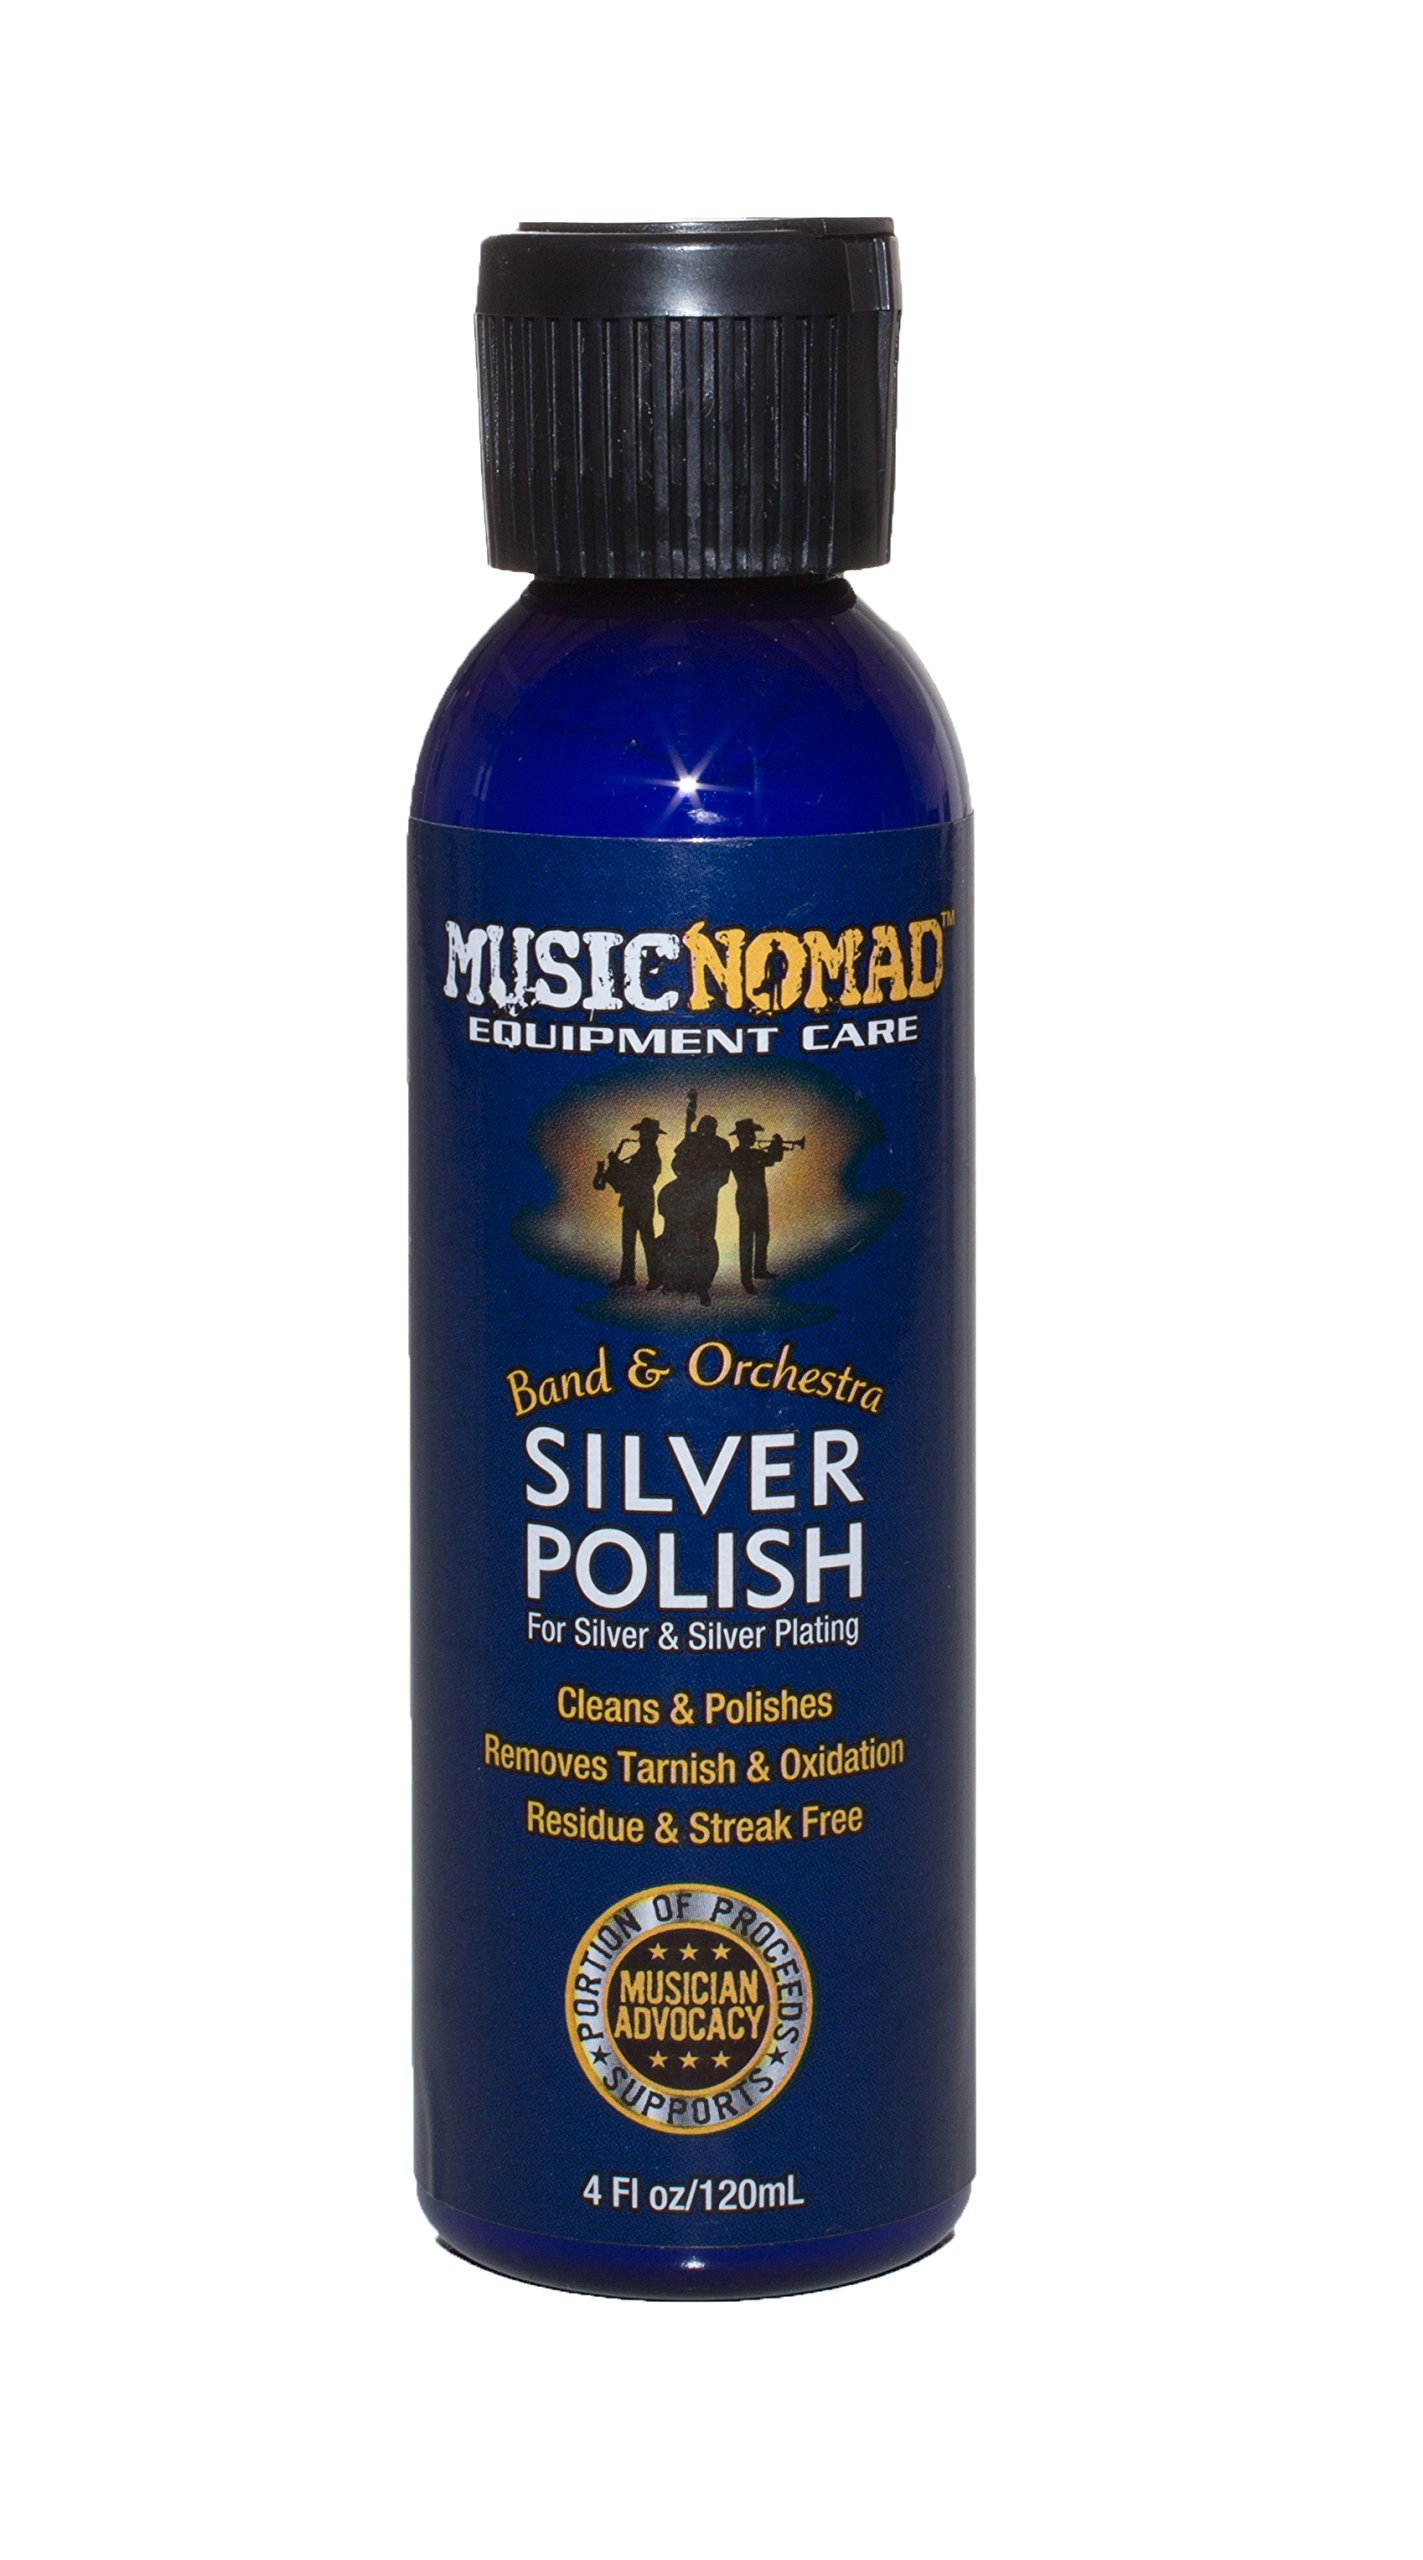 Music Nomad Silver Polish